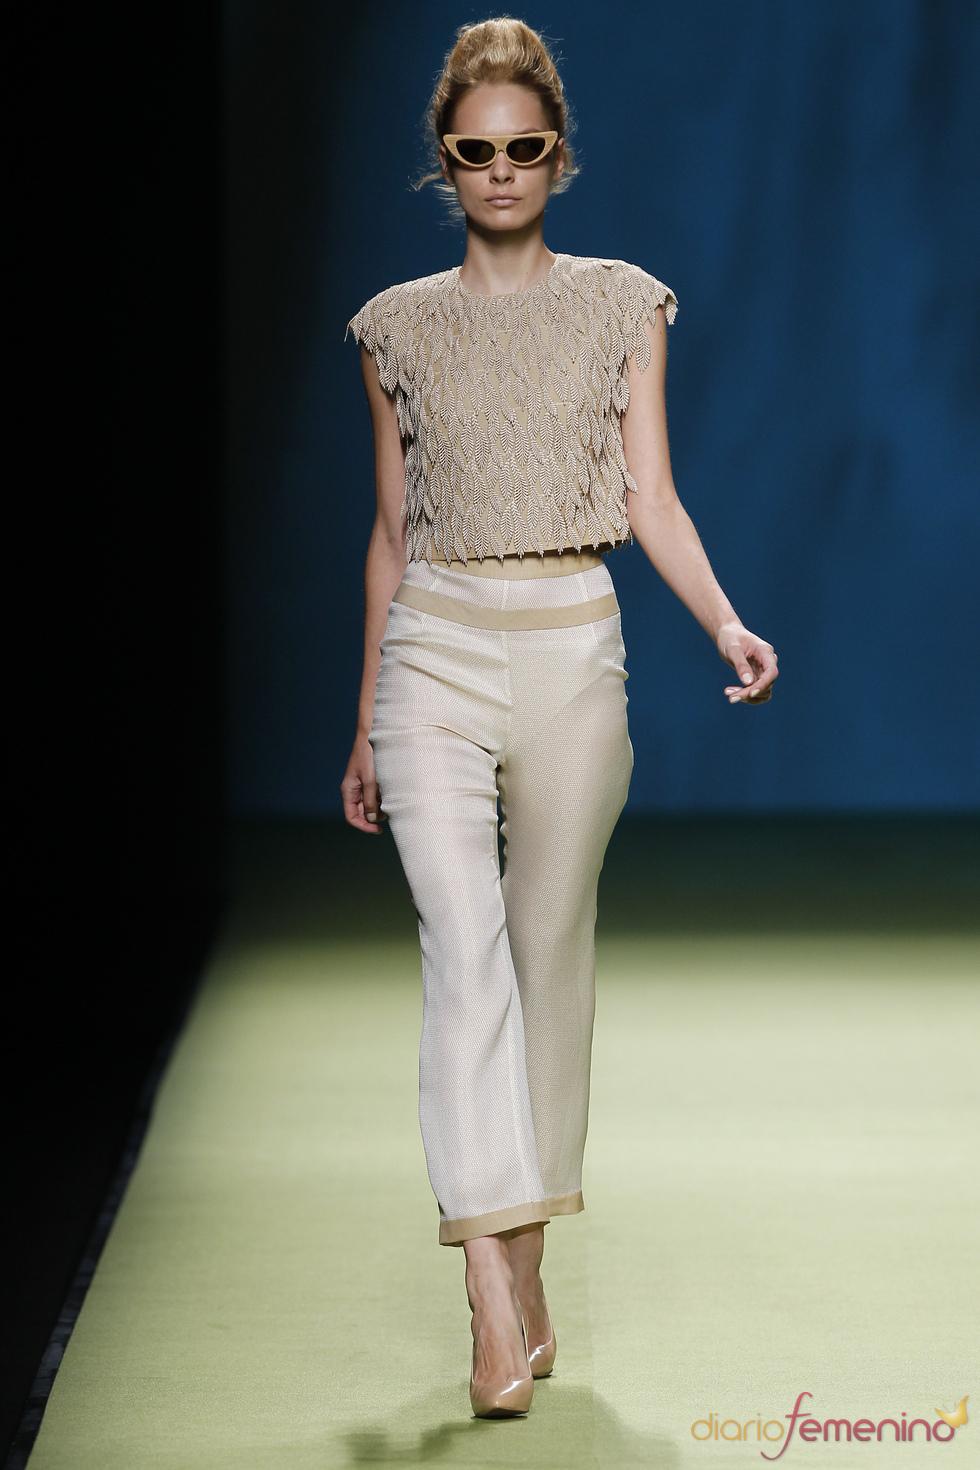 Cibeles Madrid Fashion Week 09-2010: Duyos